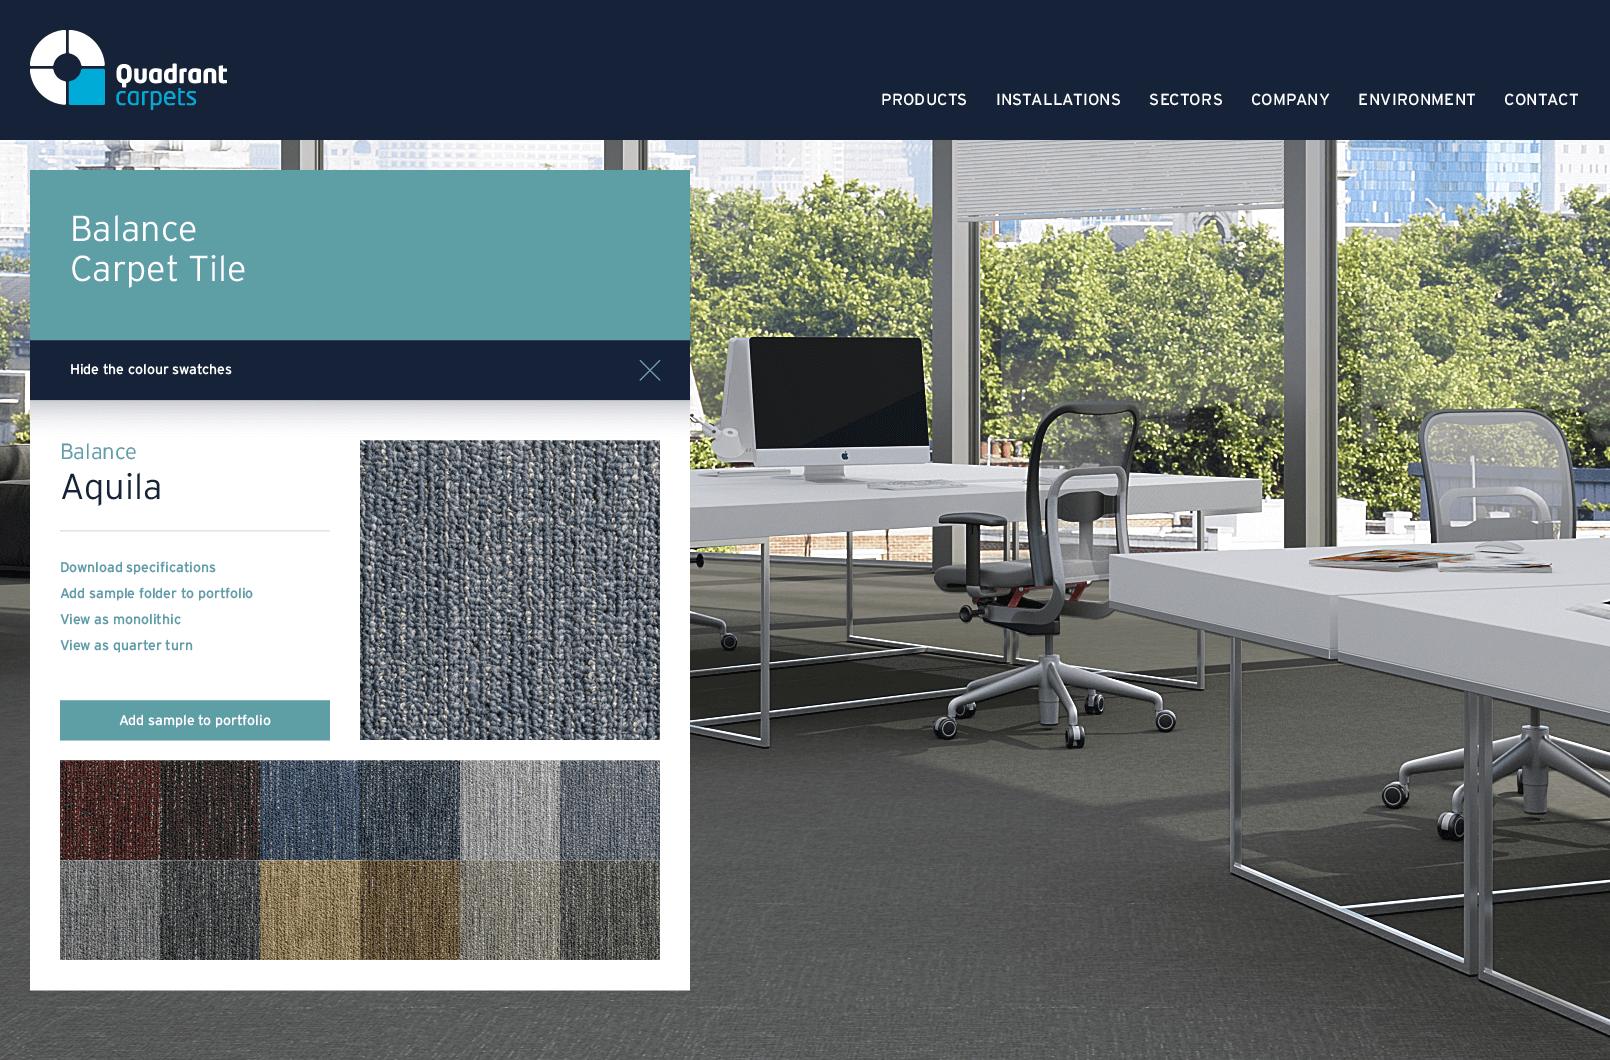 Quadrant website product details